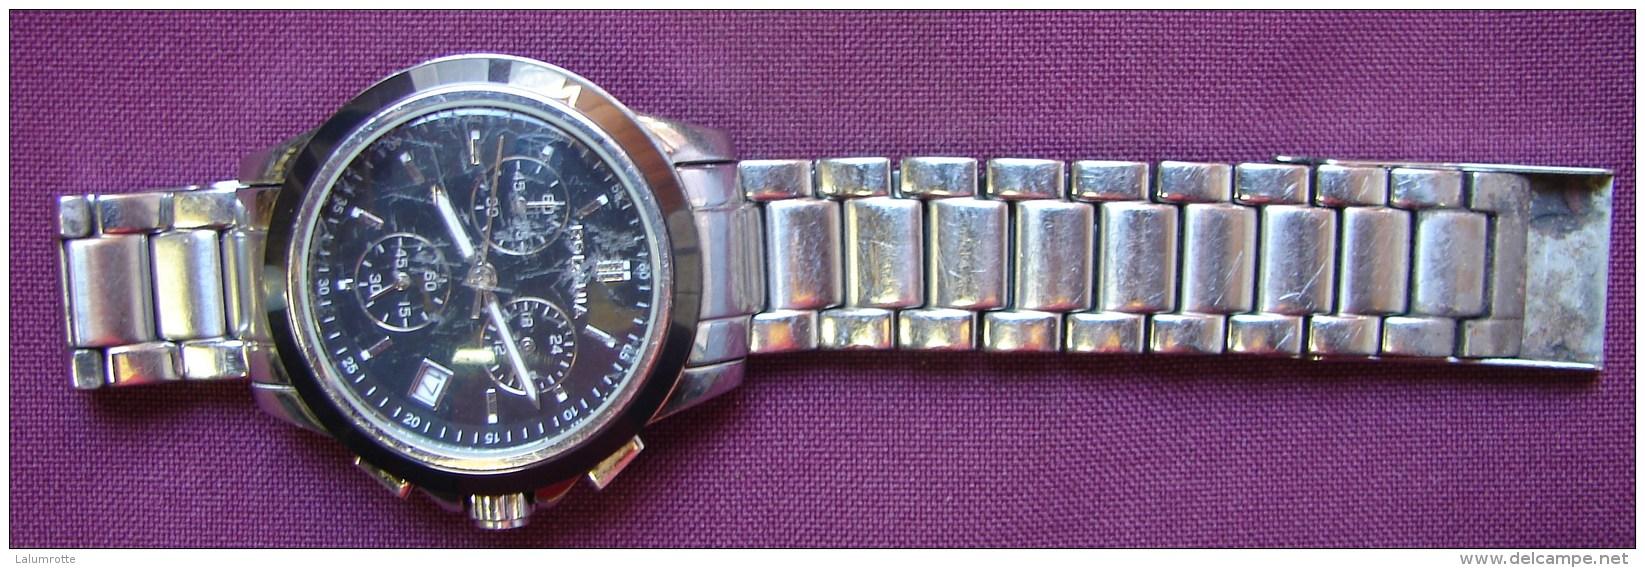 Montre. 4.  Montre Rodania Type 32. Dans Sa Boîte - Watches: Top-of-the-Line